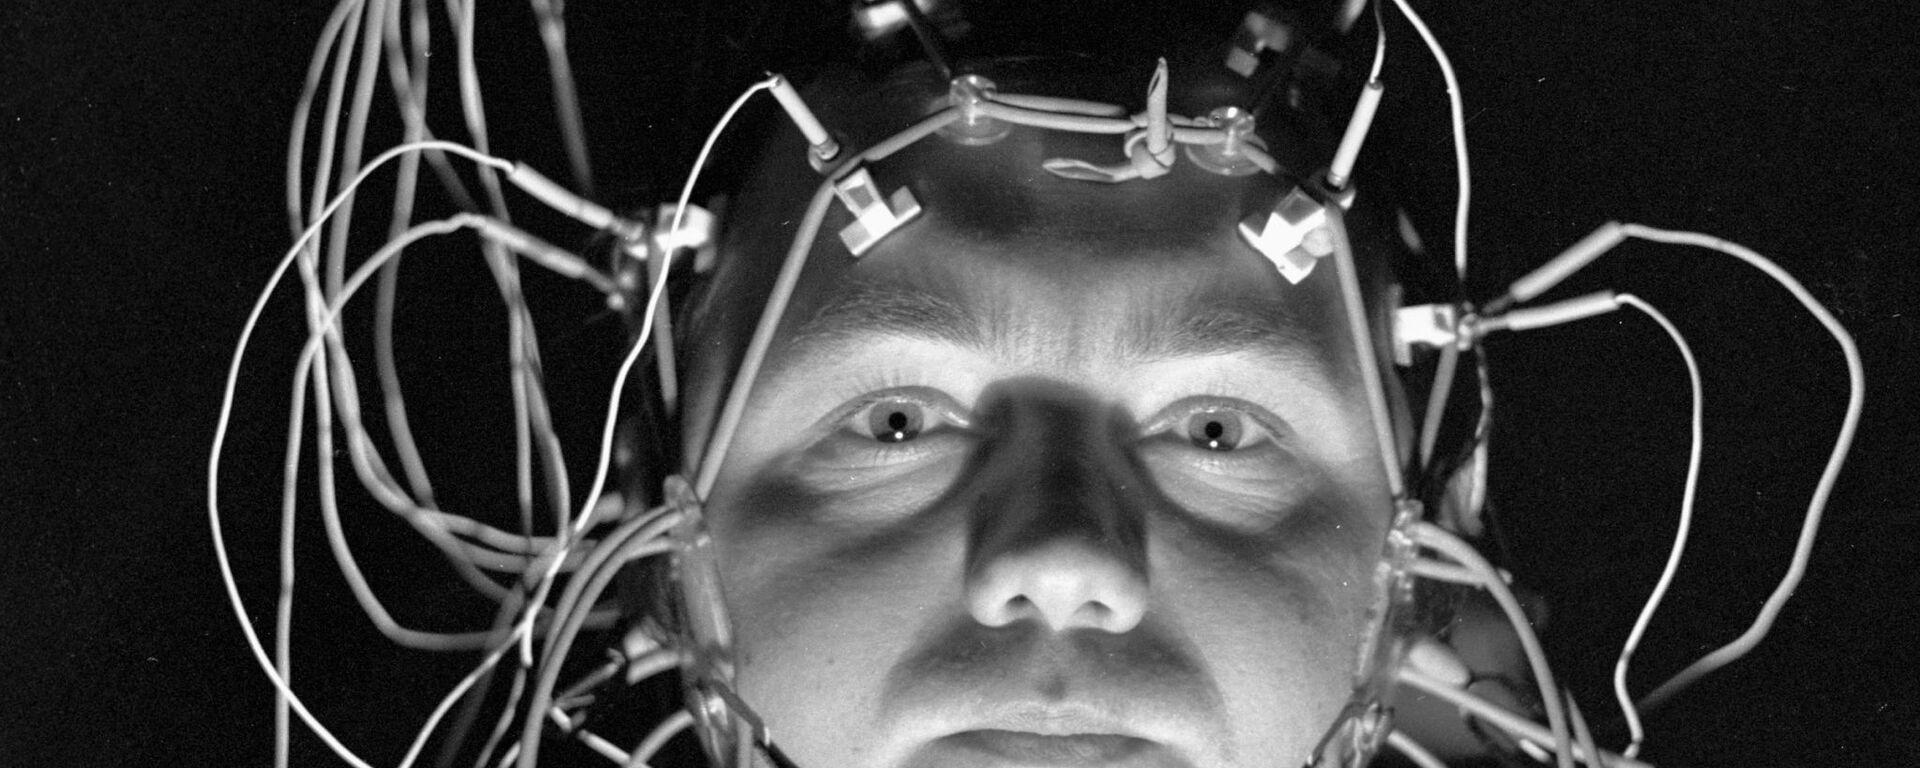 мозг человека - Sputnik Армения, 1920, 20.04.2021